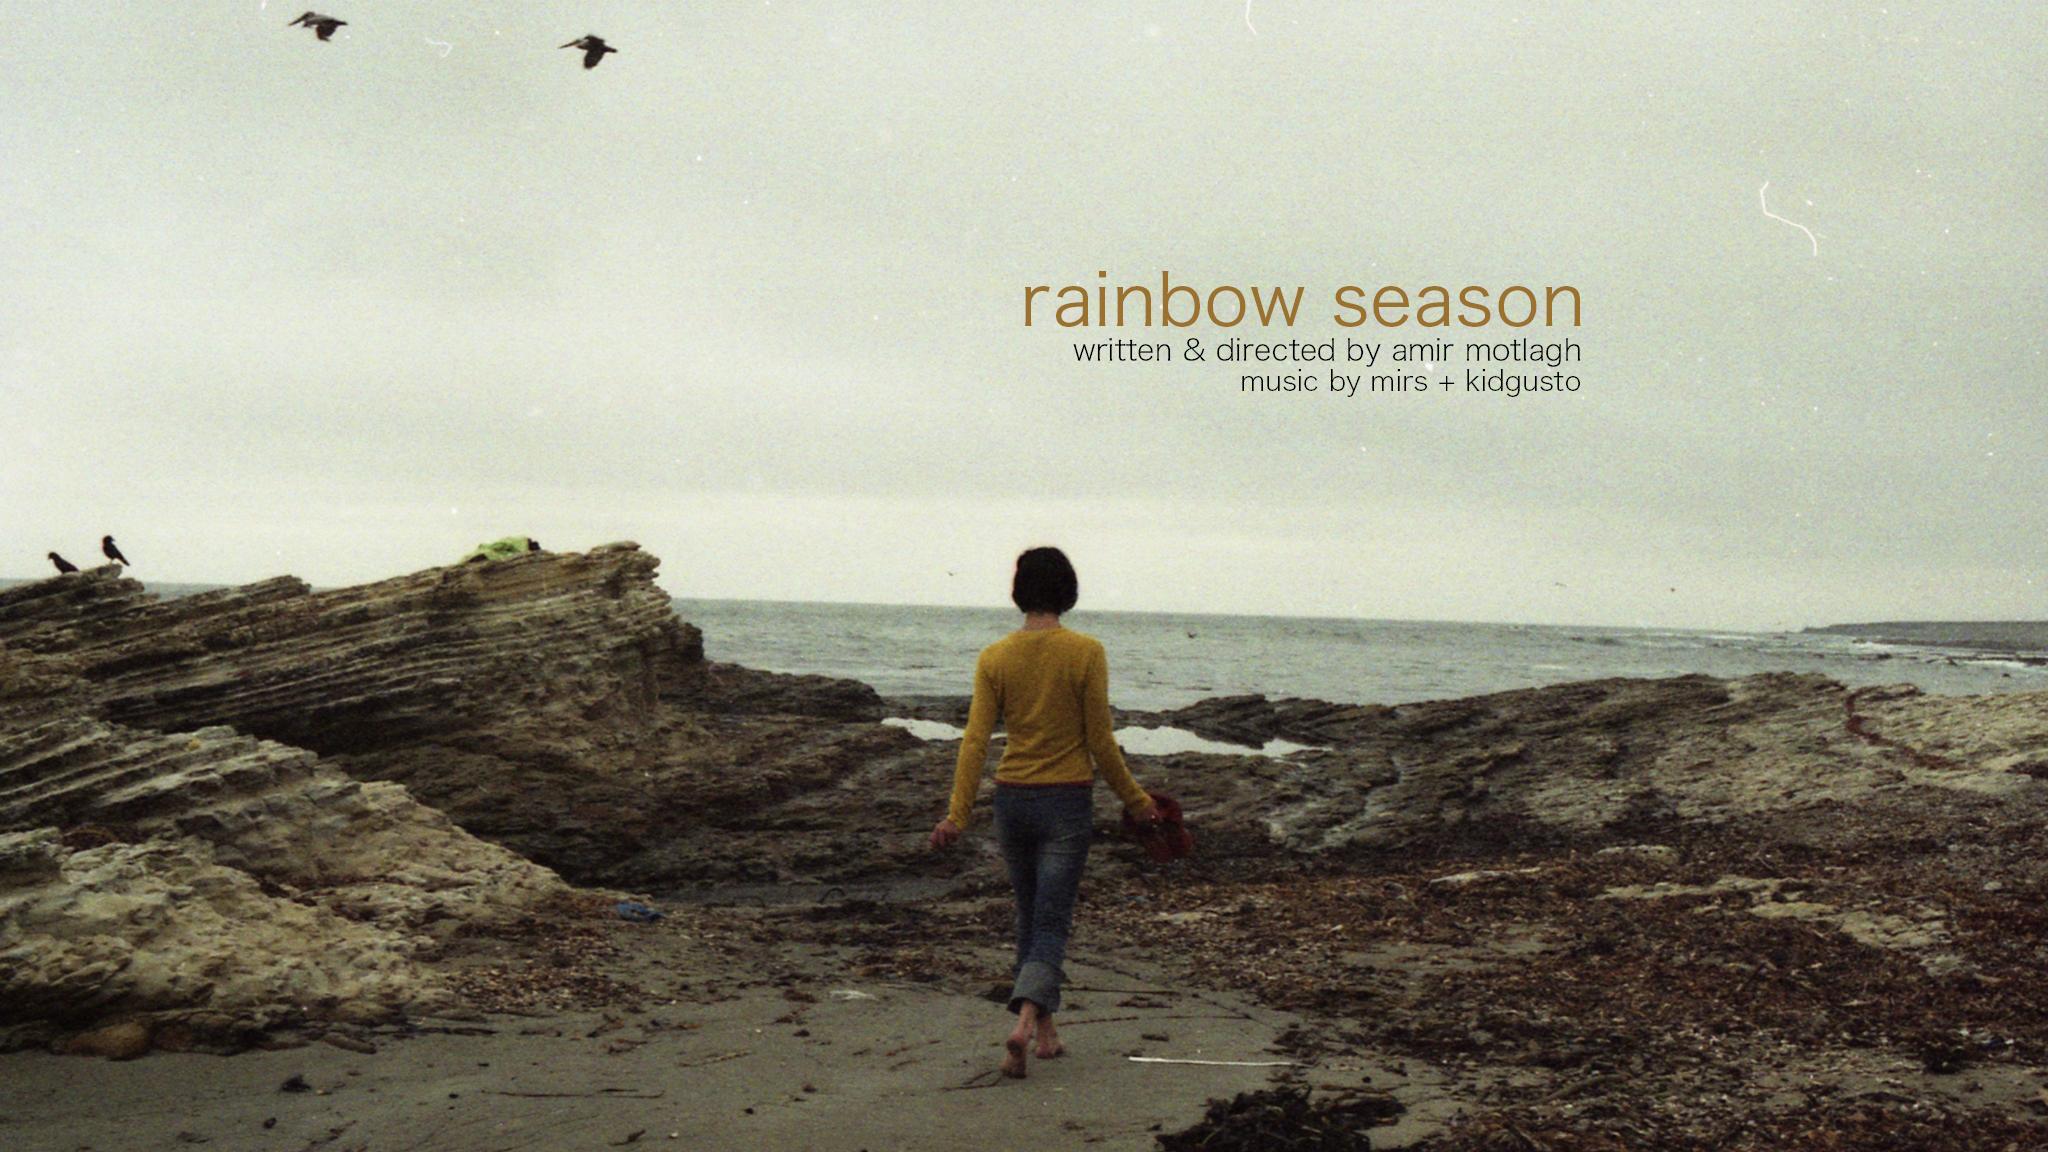 rainbow season the film_16_9.png